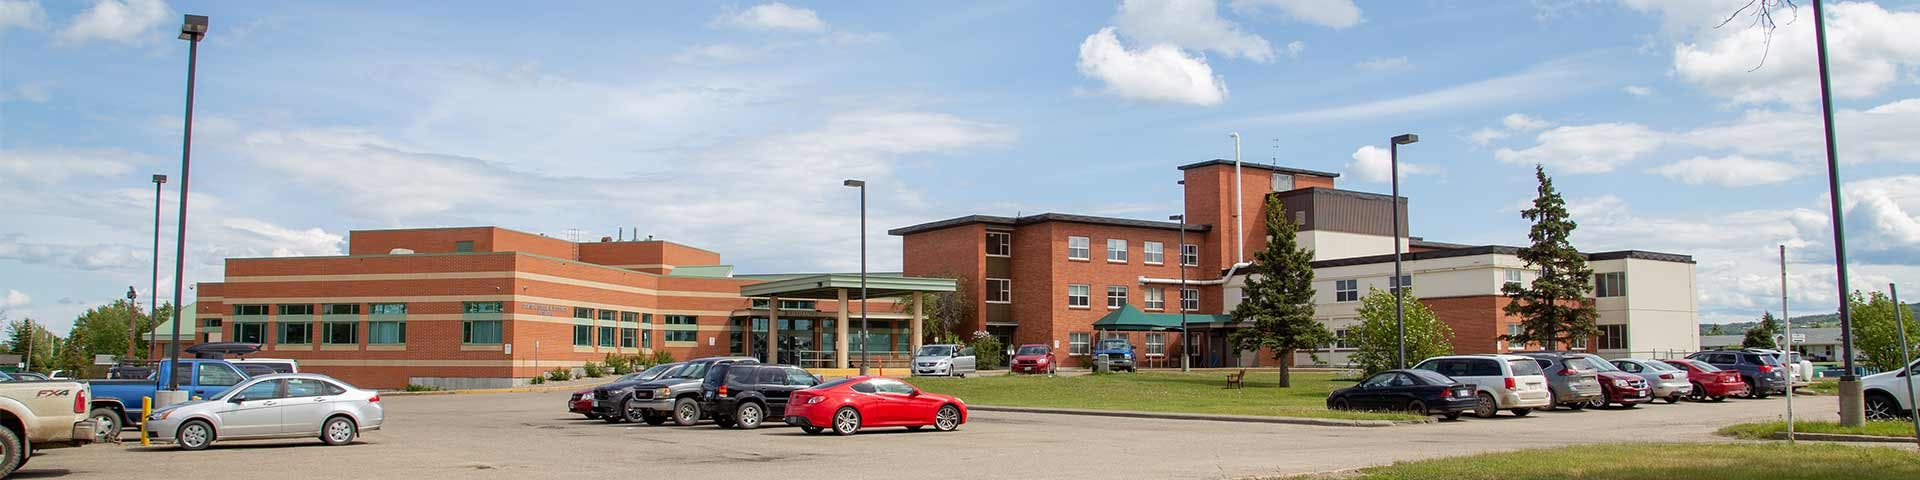 Dawson Creek and District Hospital